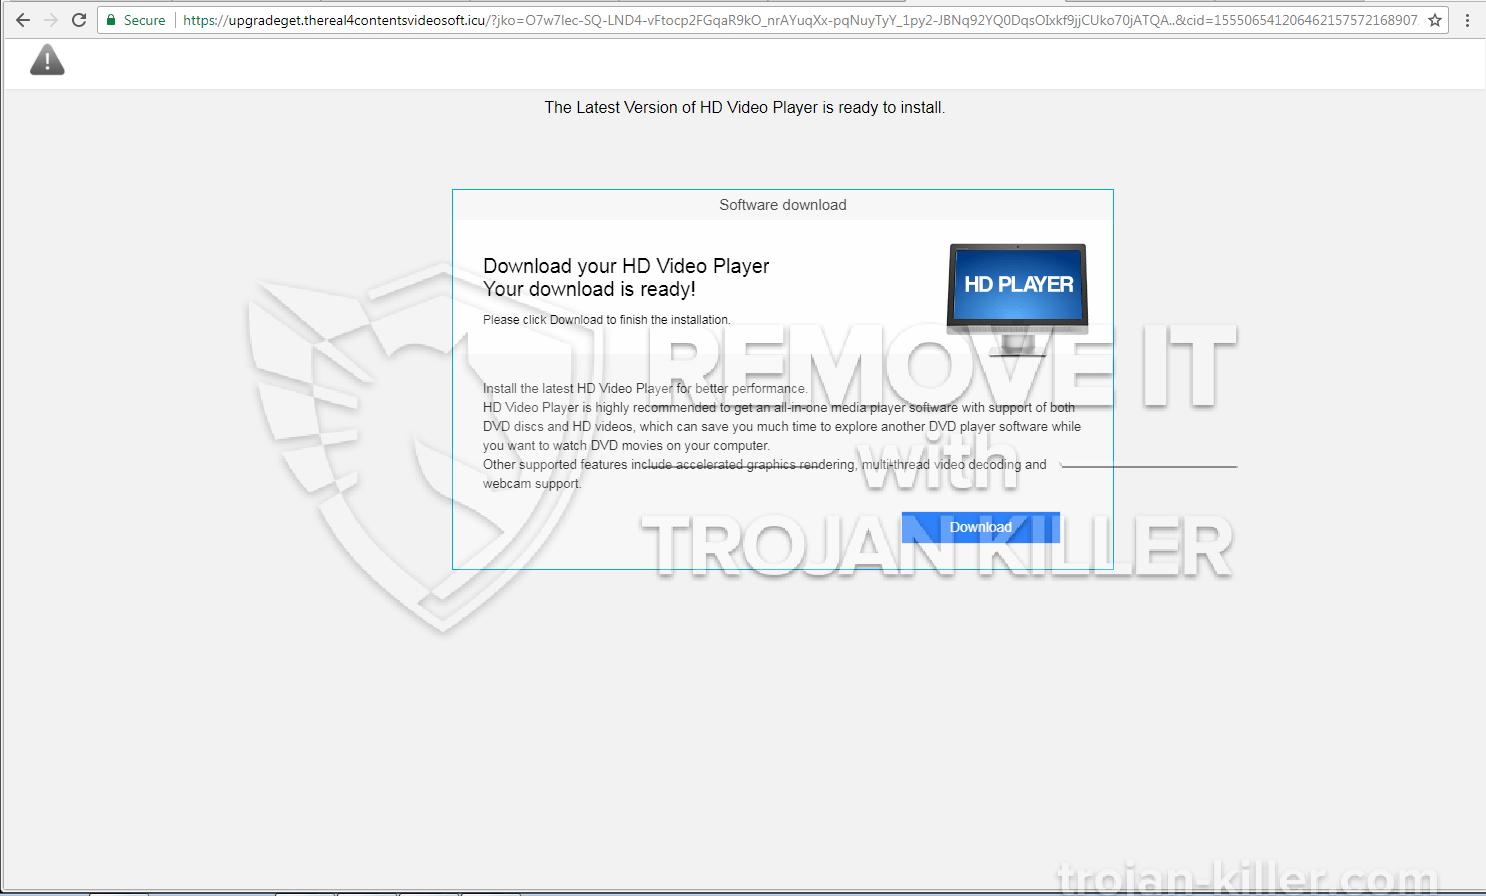 Thereal4contentsvideosoft.icu virus